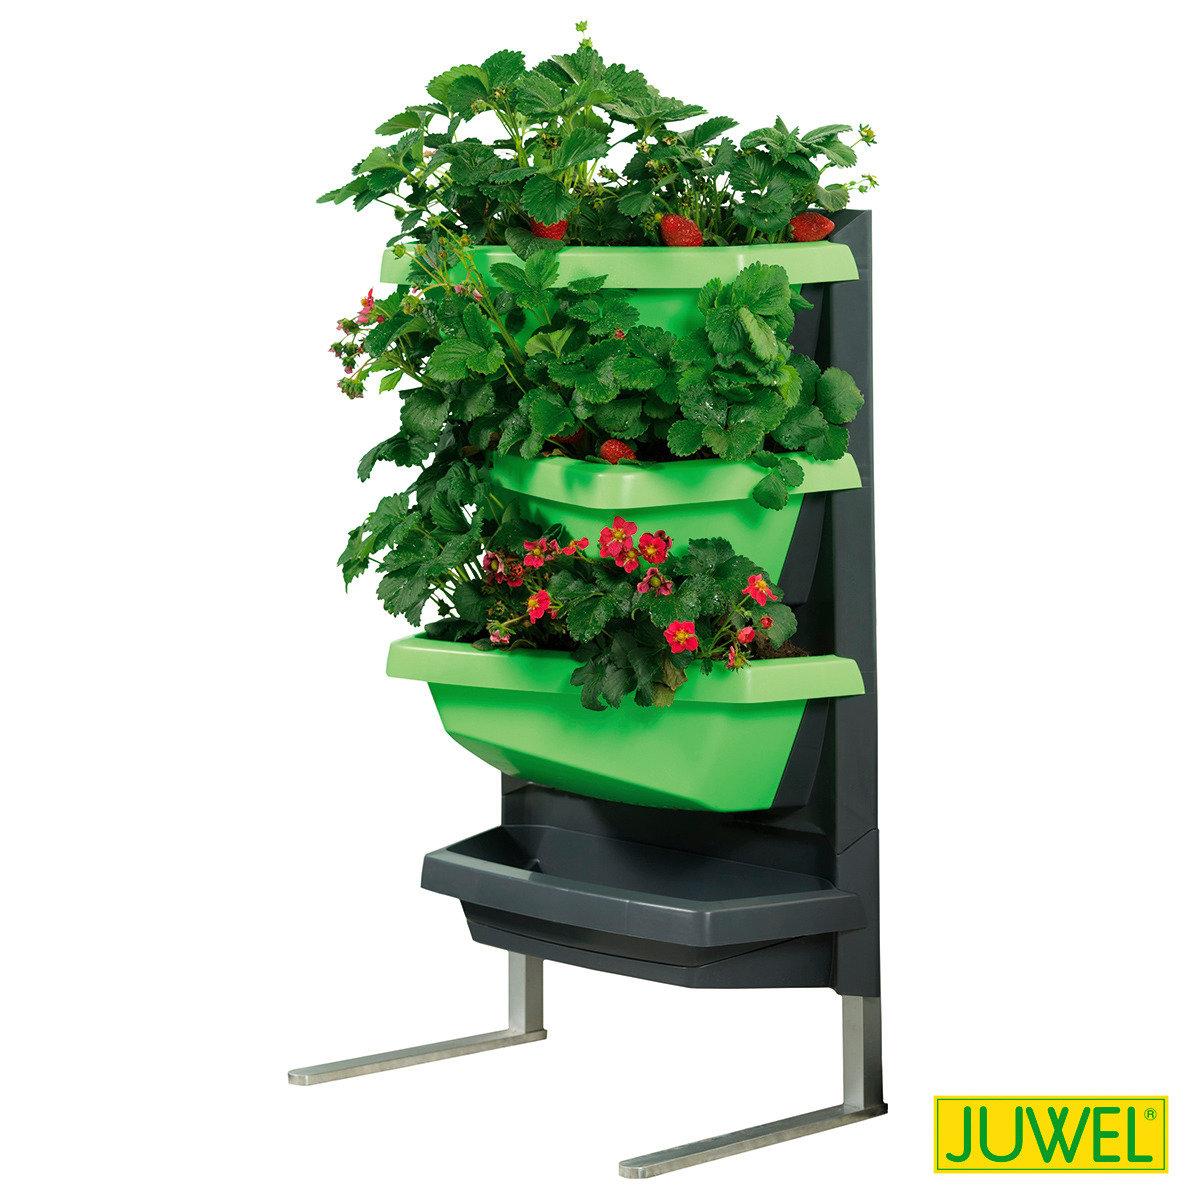 juwel vertical garden standfu aus aluminium online kaufen bei g rtner p tschke. Black Bedroom Furniture Sets. Home Design Ideas